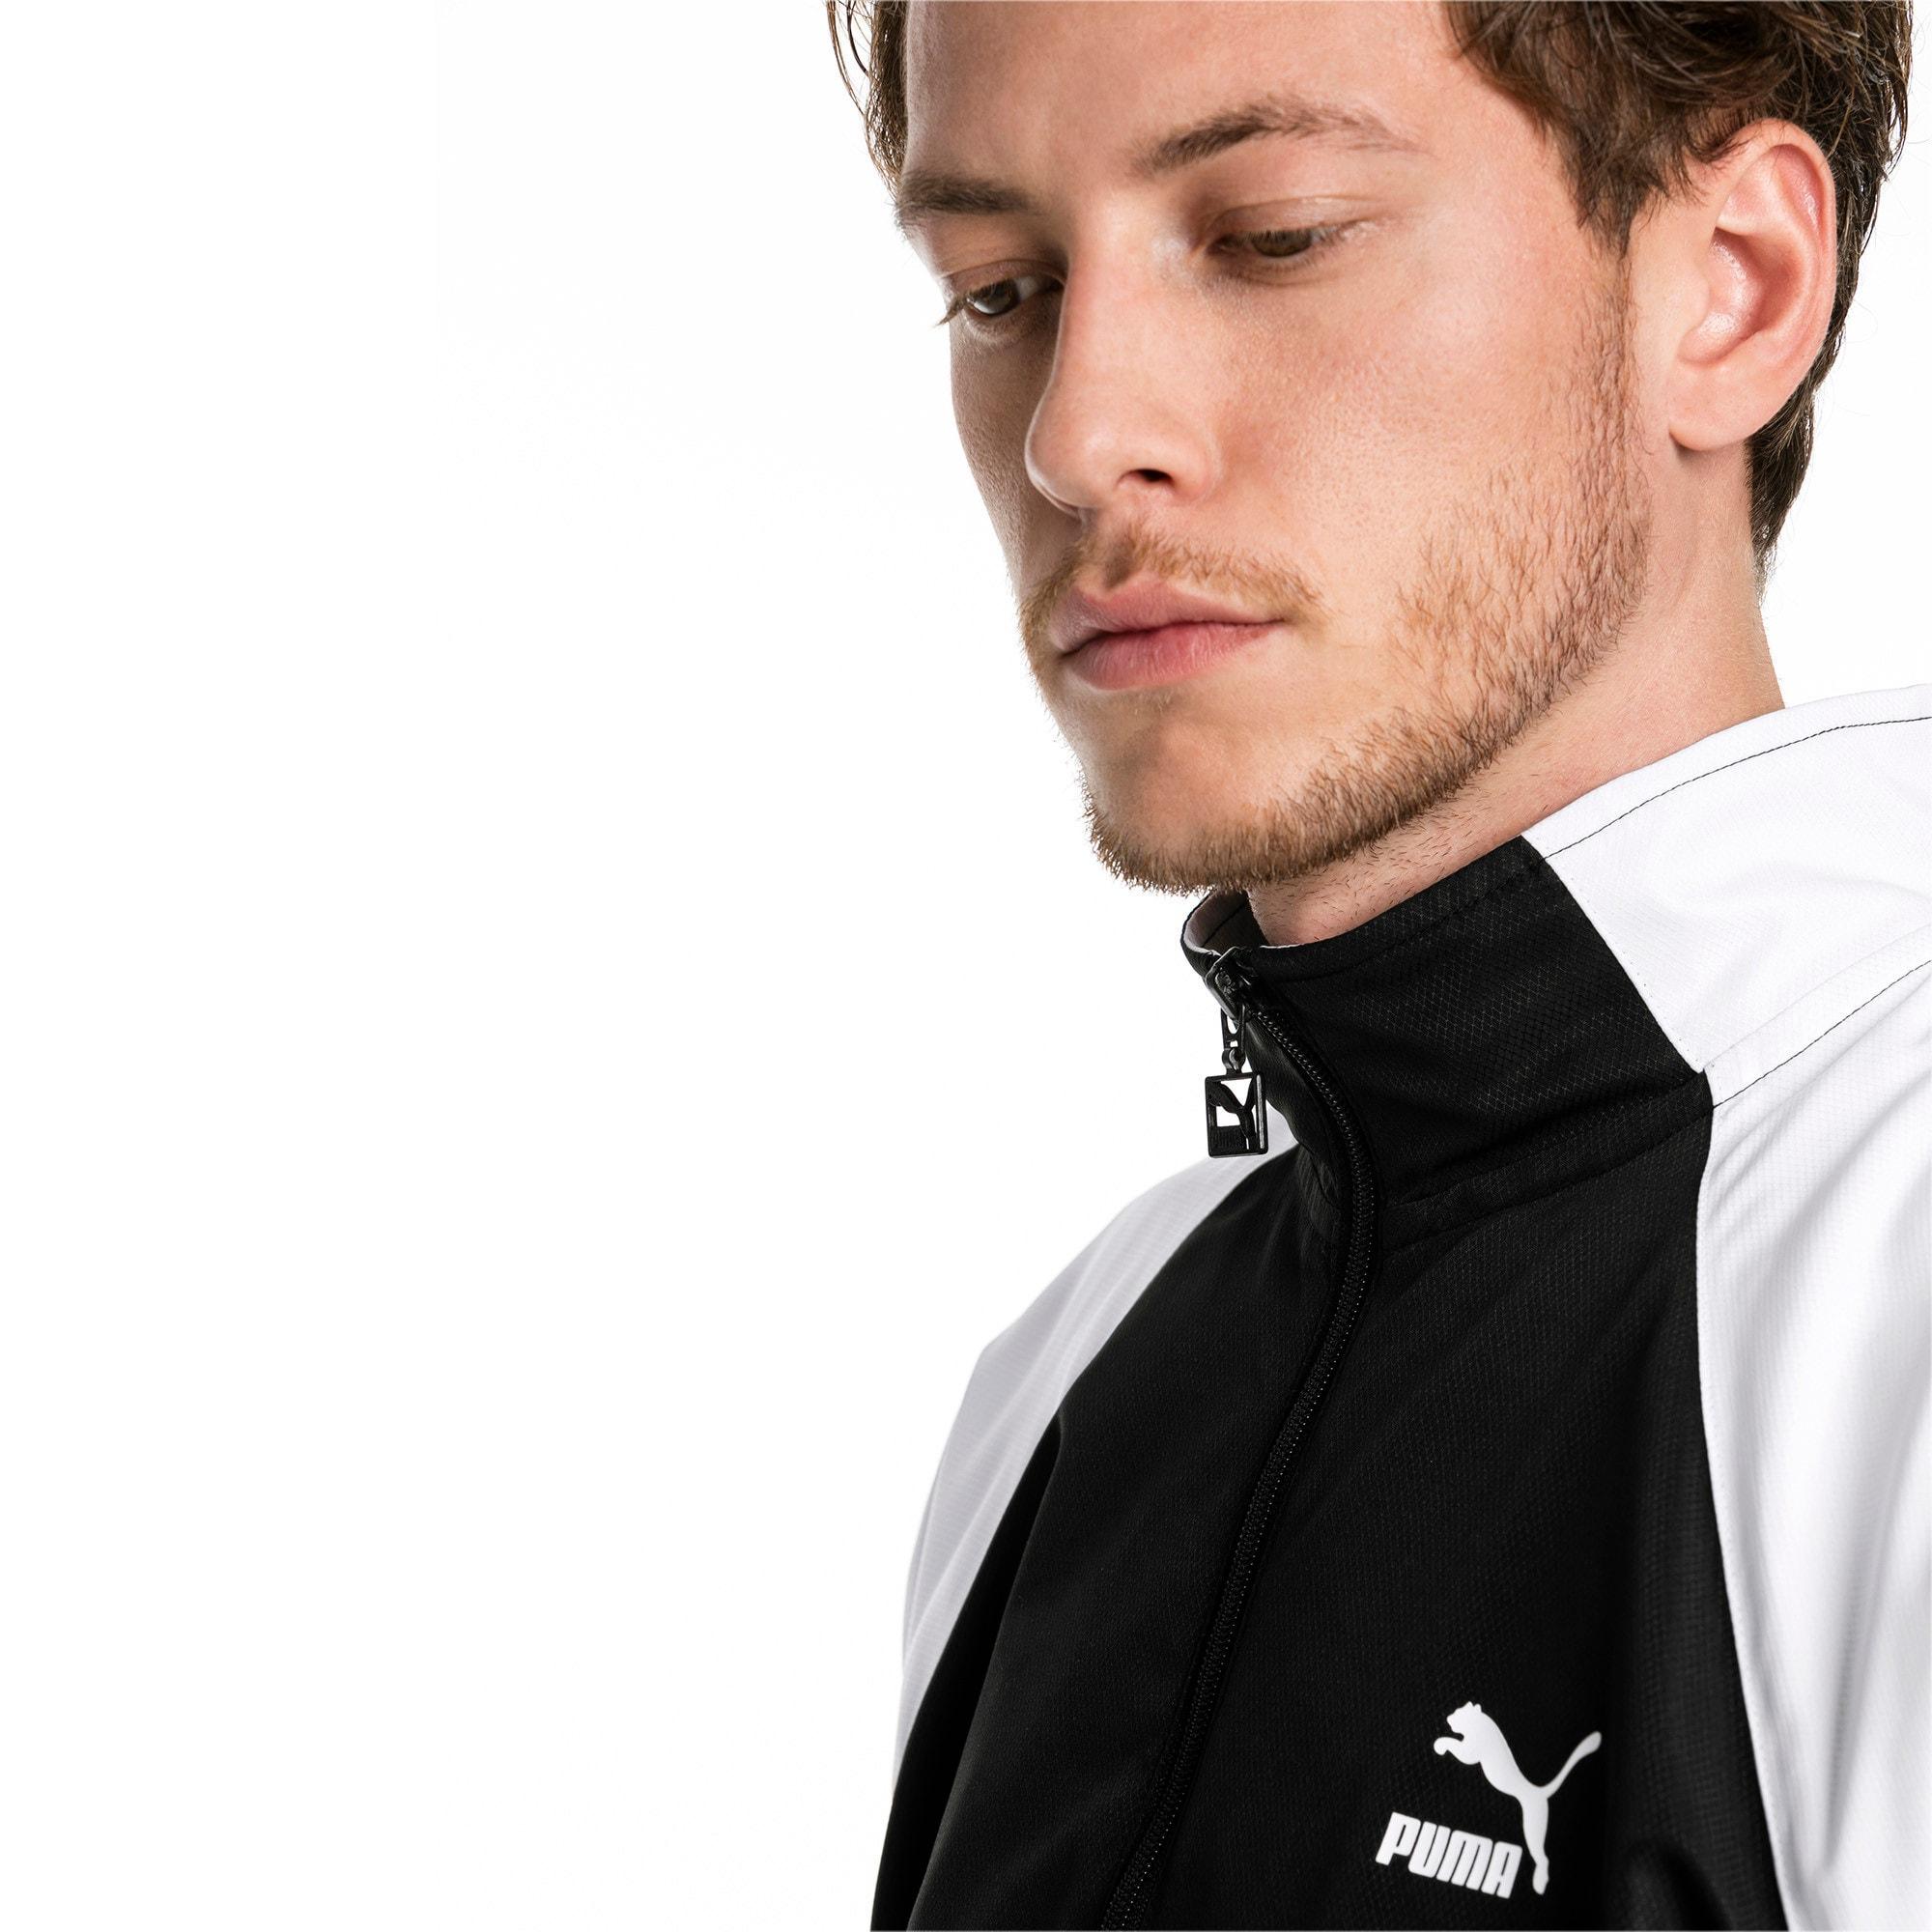 Thumbnail 4 of PUMA XTG Full Zip Men's Woven Jacket, Puma Black-Puma white, medium